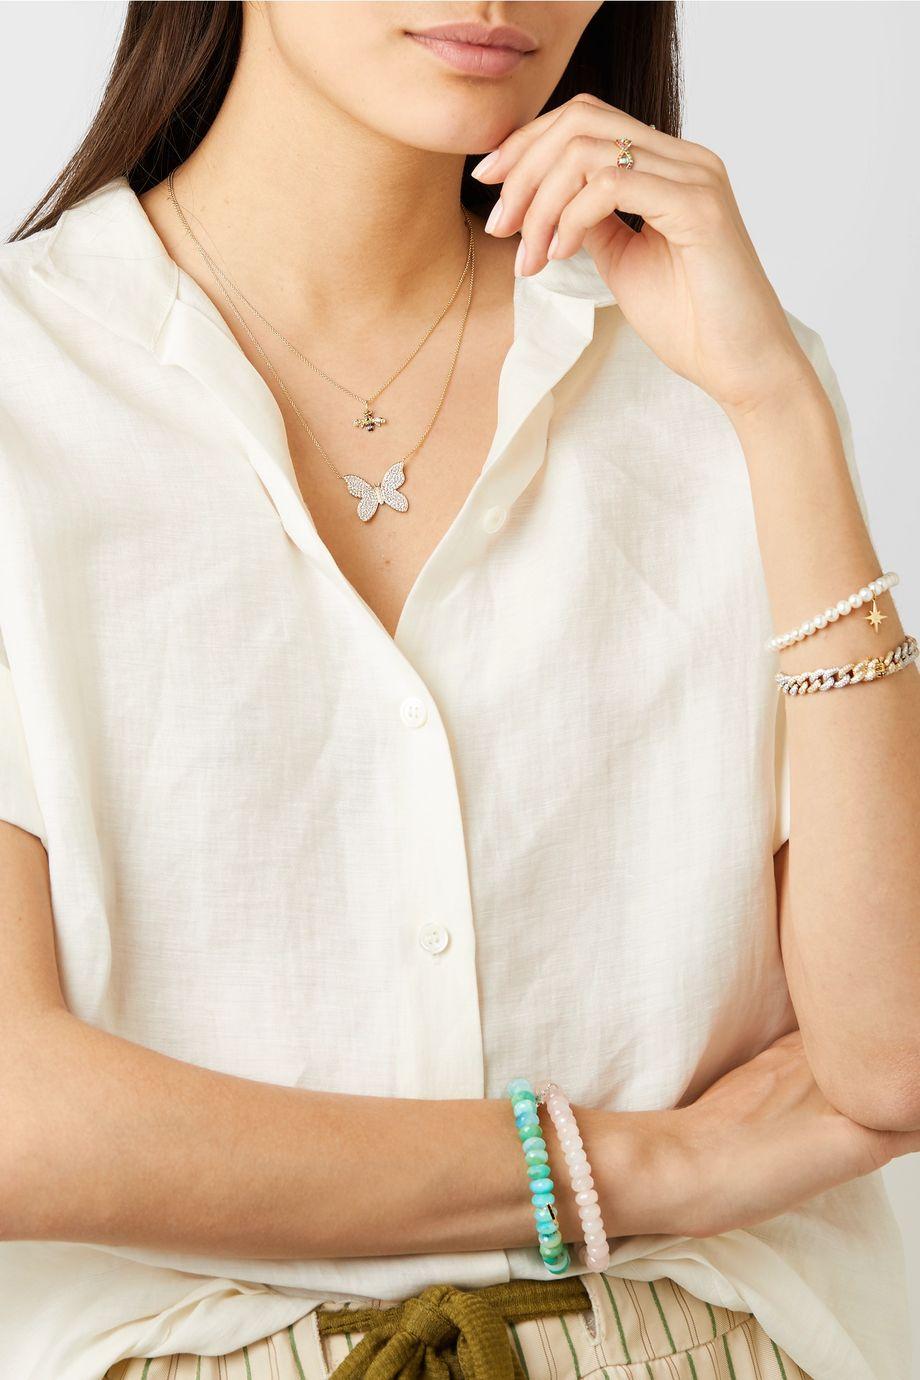 Sydney Evan Small Bee 14-karat gold diamond necklace